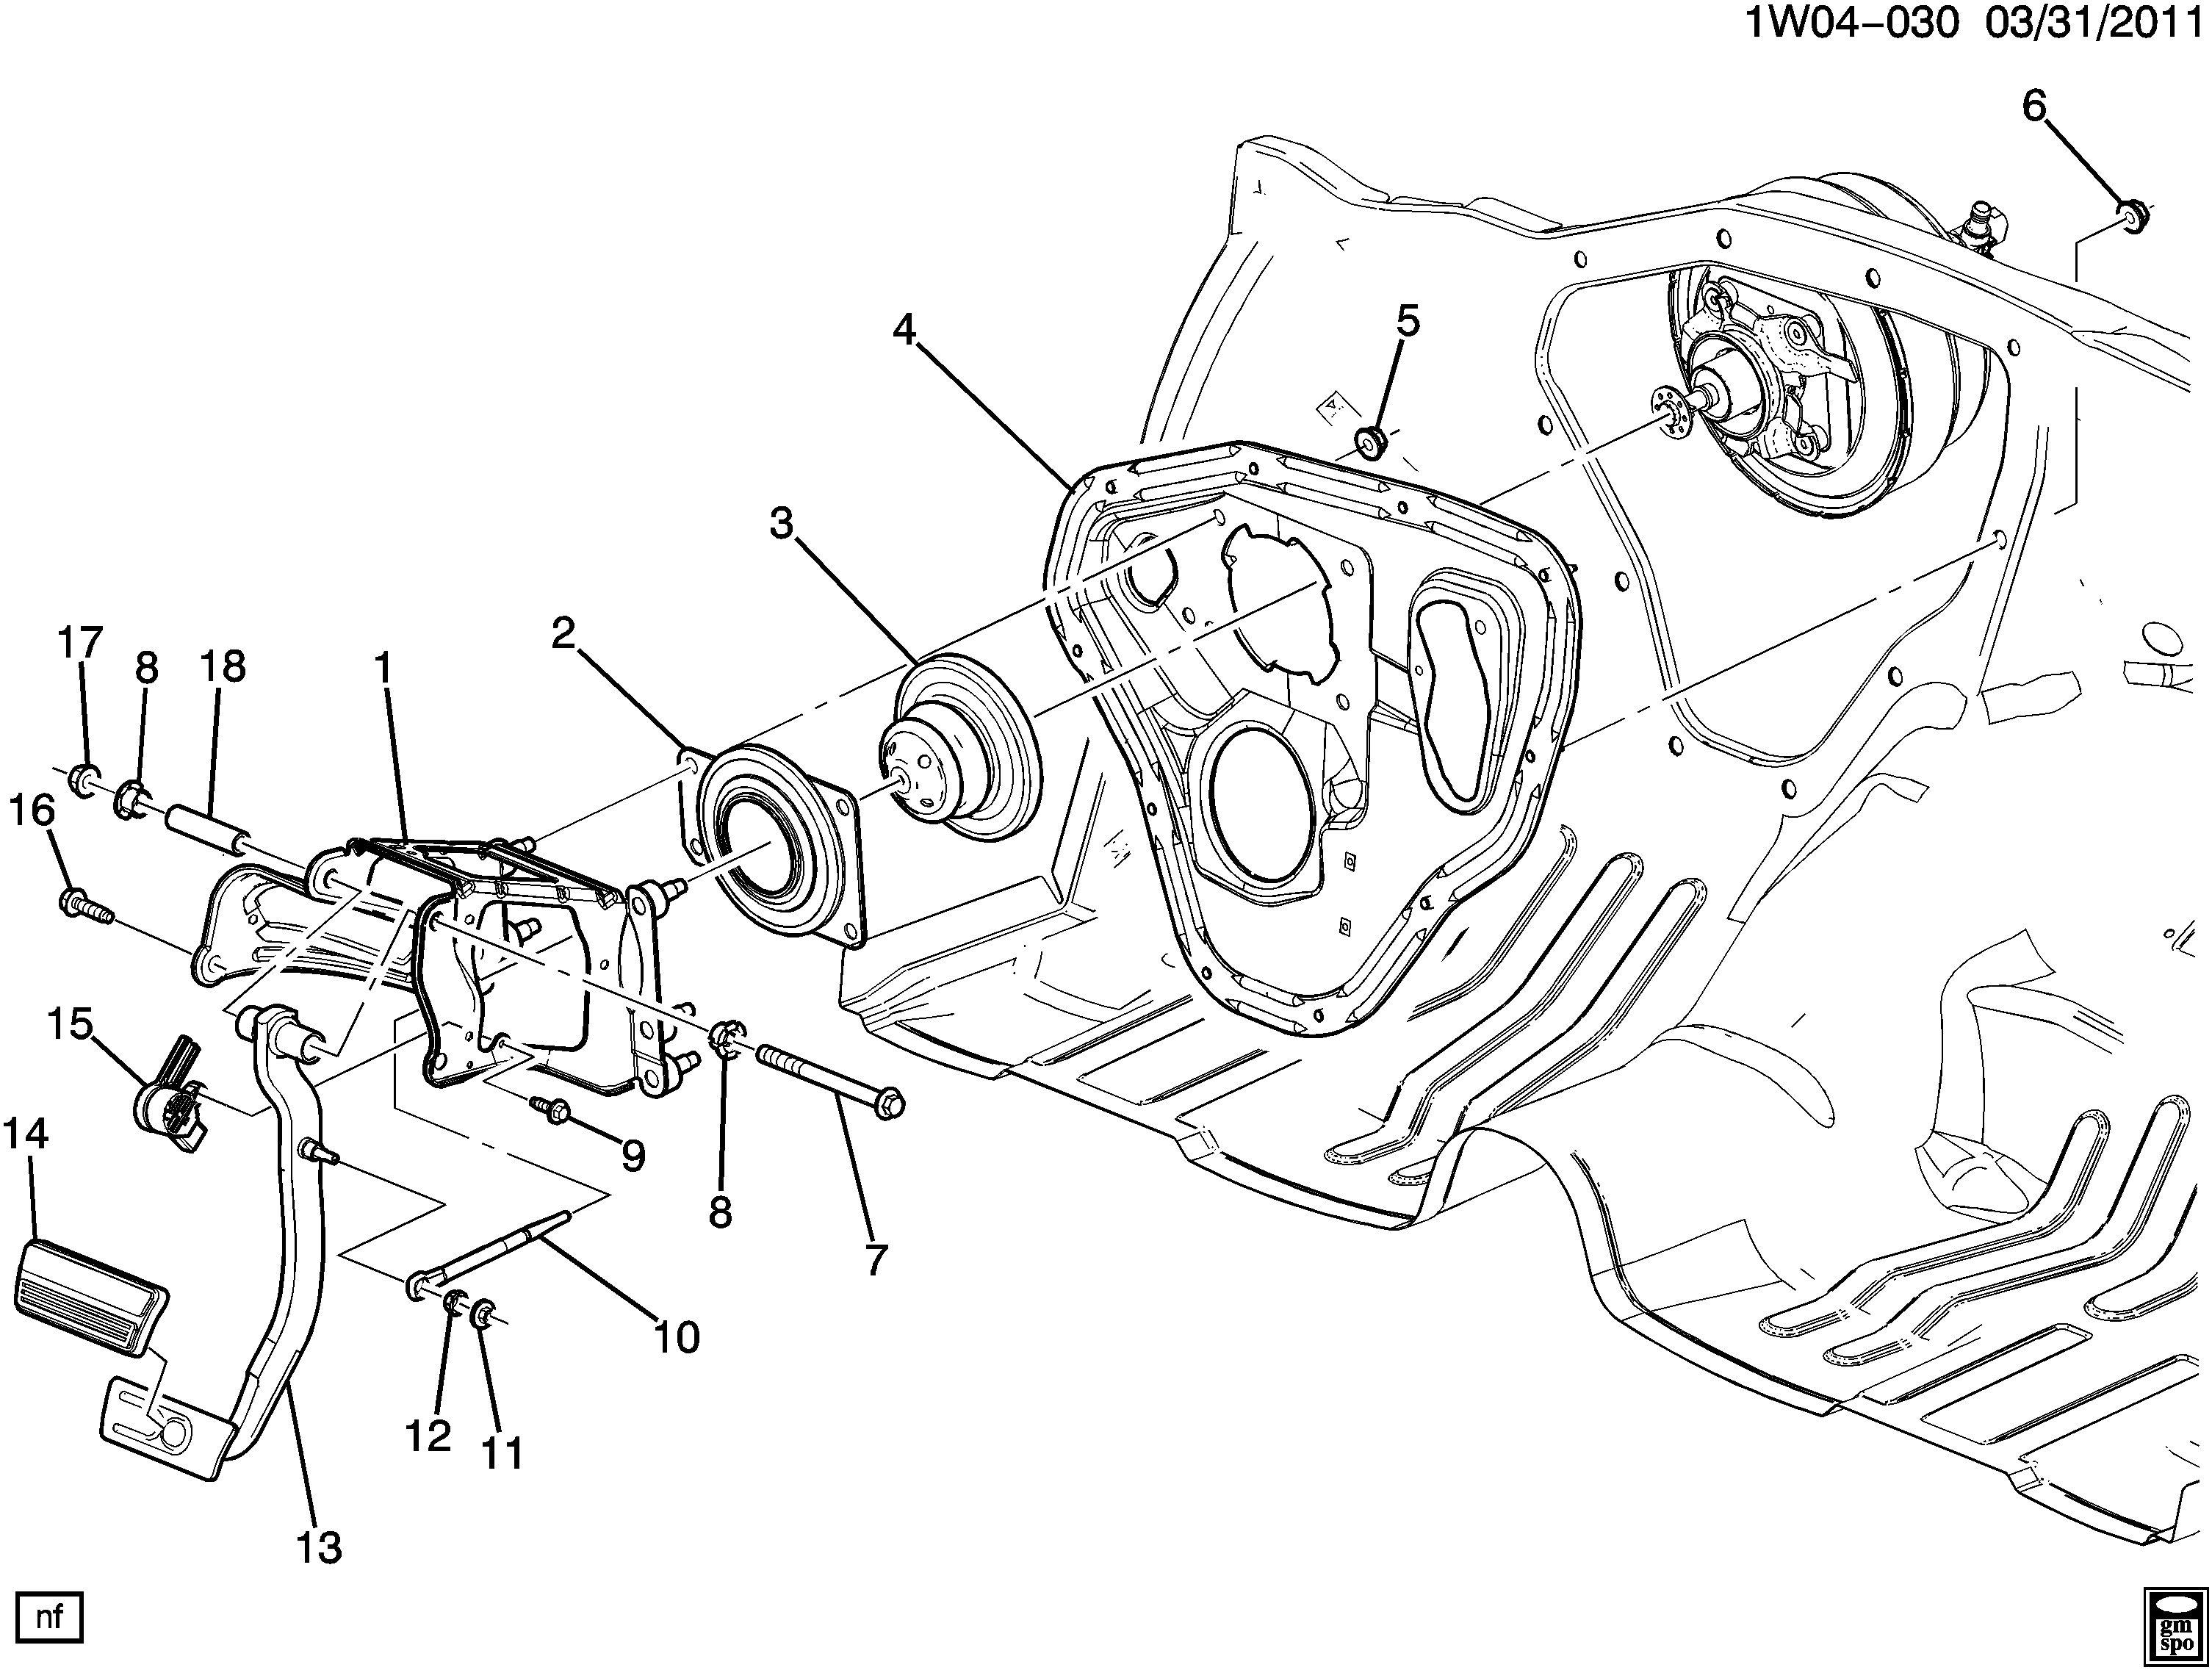 Chevrolet Impala Limited Spacer Brake Pedal Spacer Brk